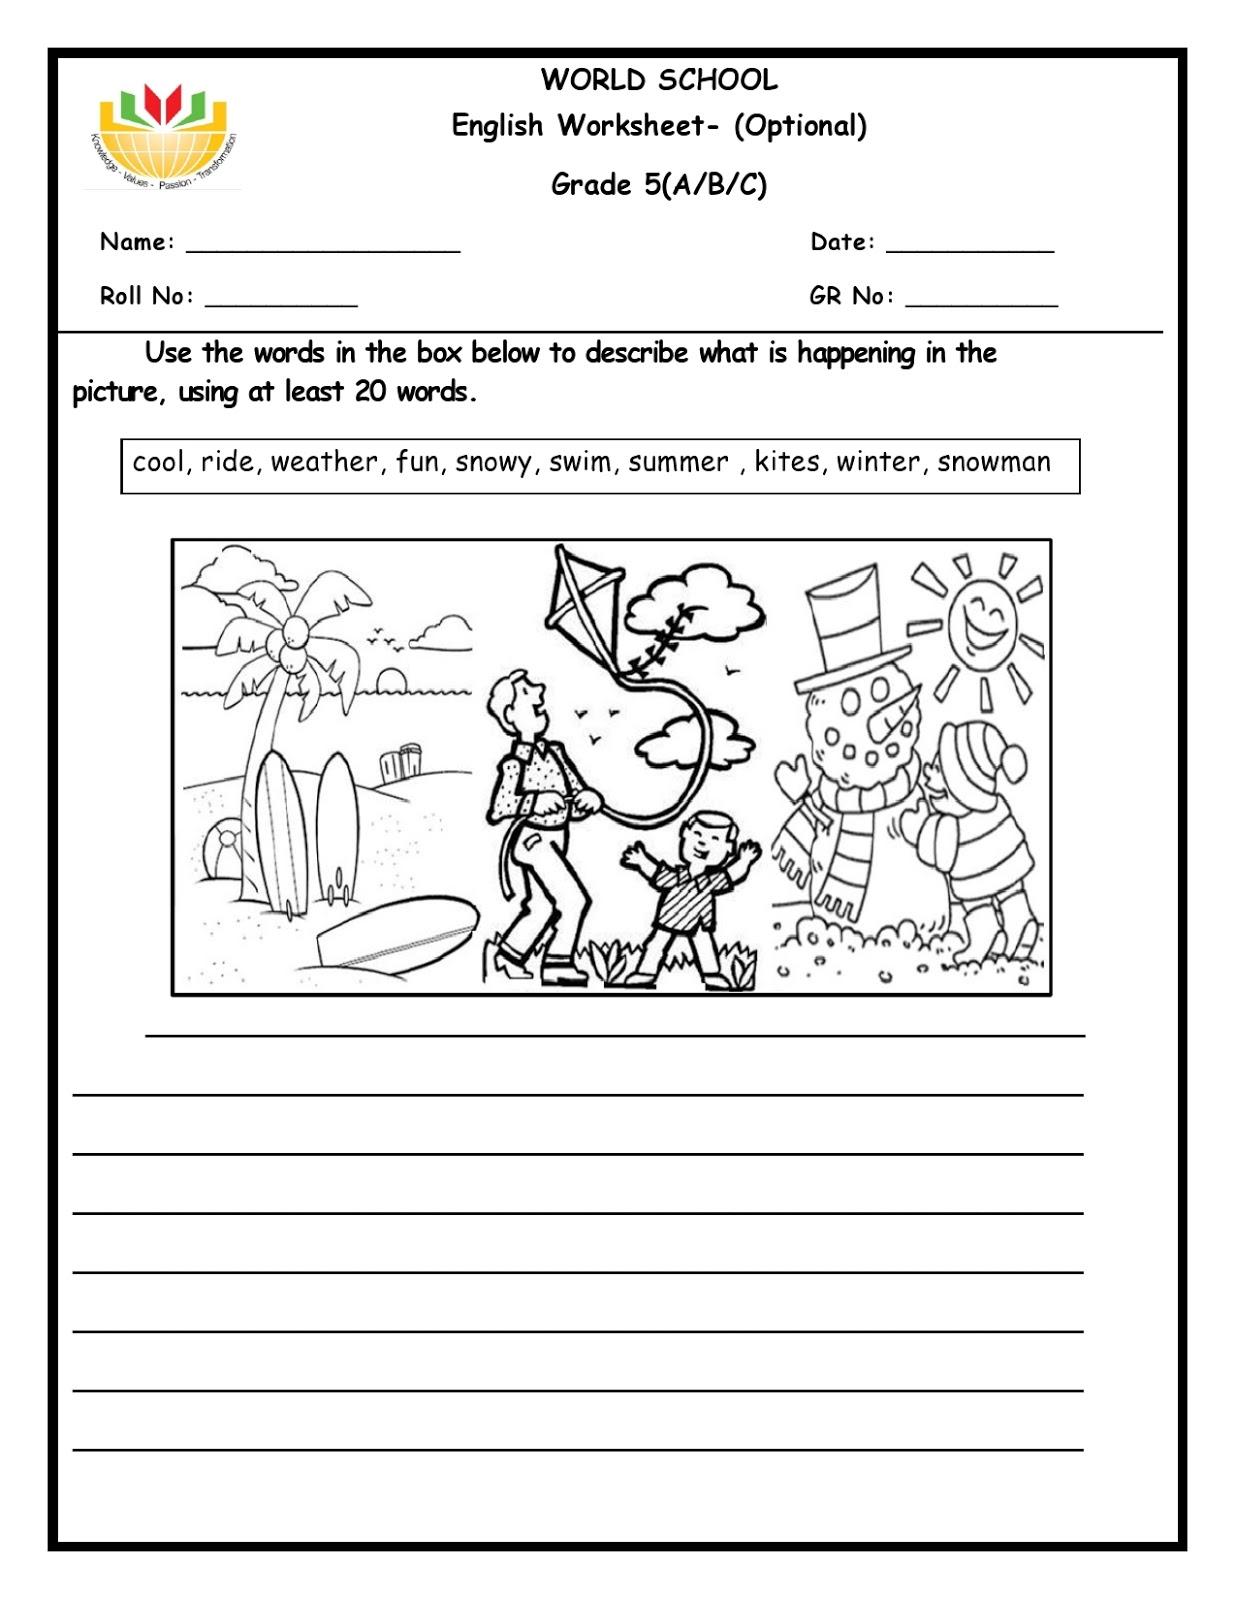 small resolution of WORLD SCHOOL OMAN: Homework for Grade 5 as on 03/03/2020